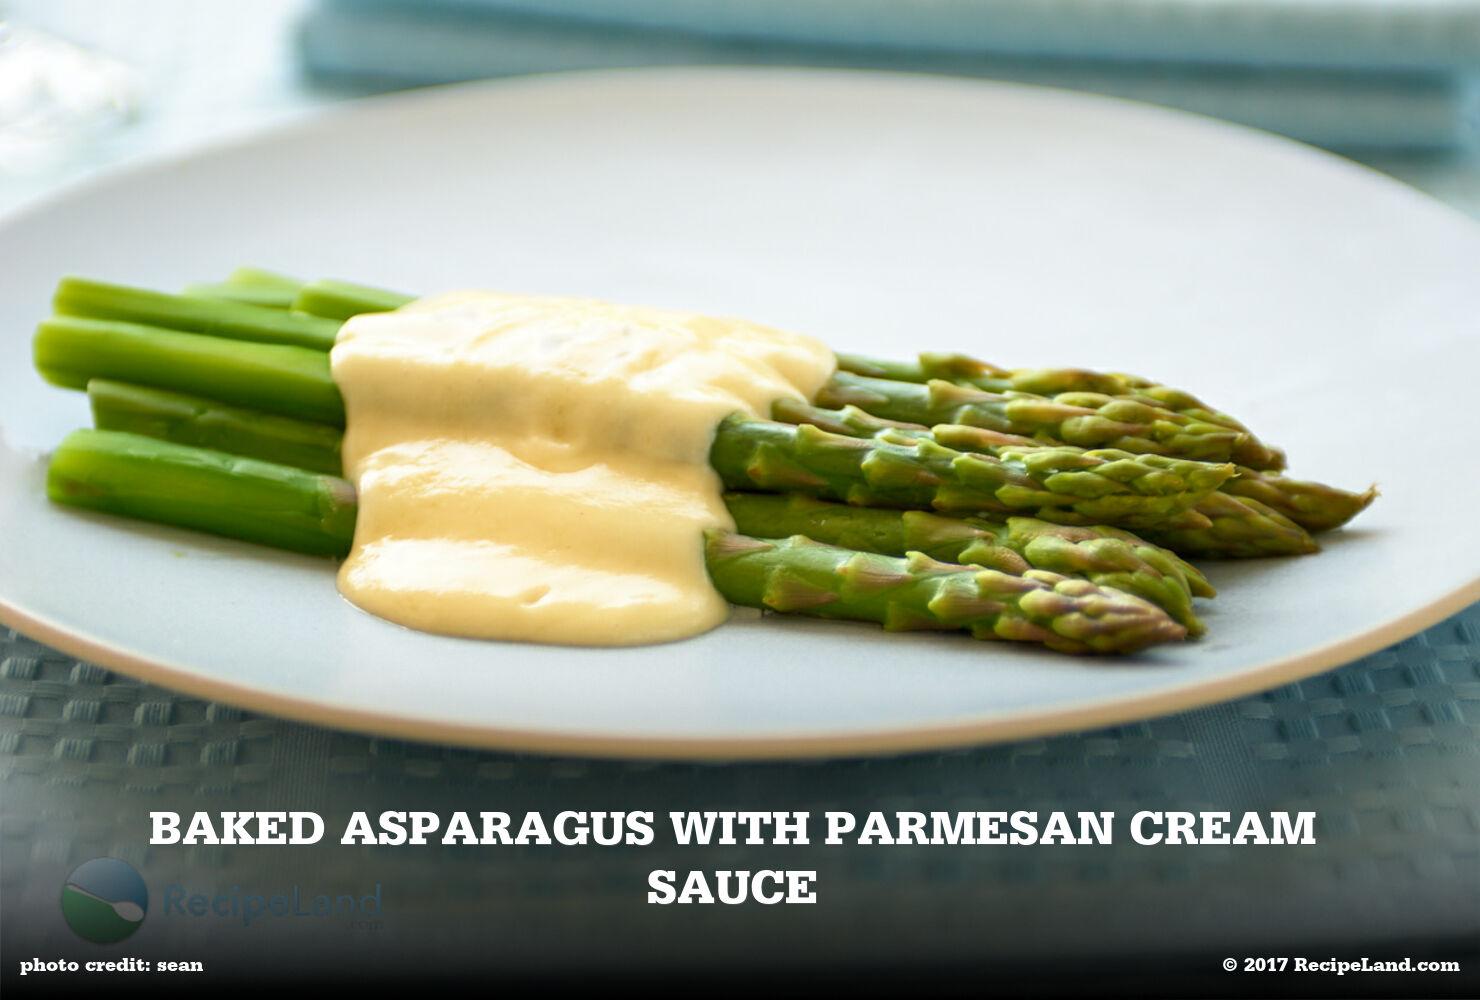 Baked Asparagus with Parmesan Cream Sauce